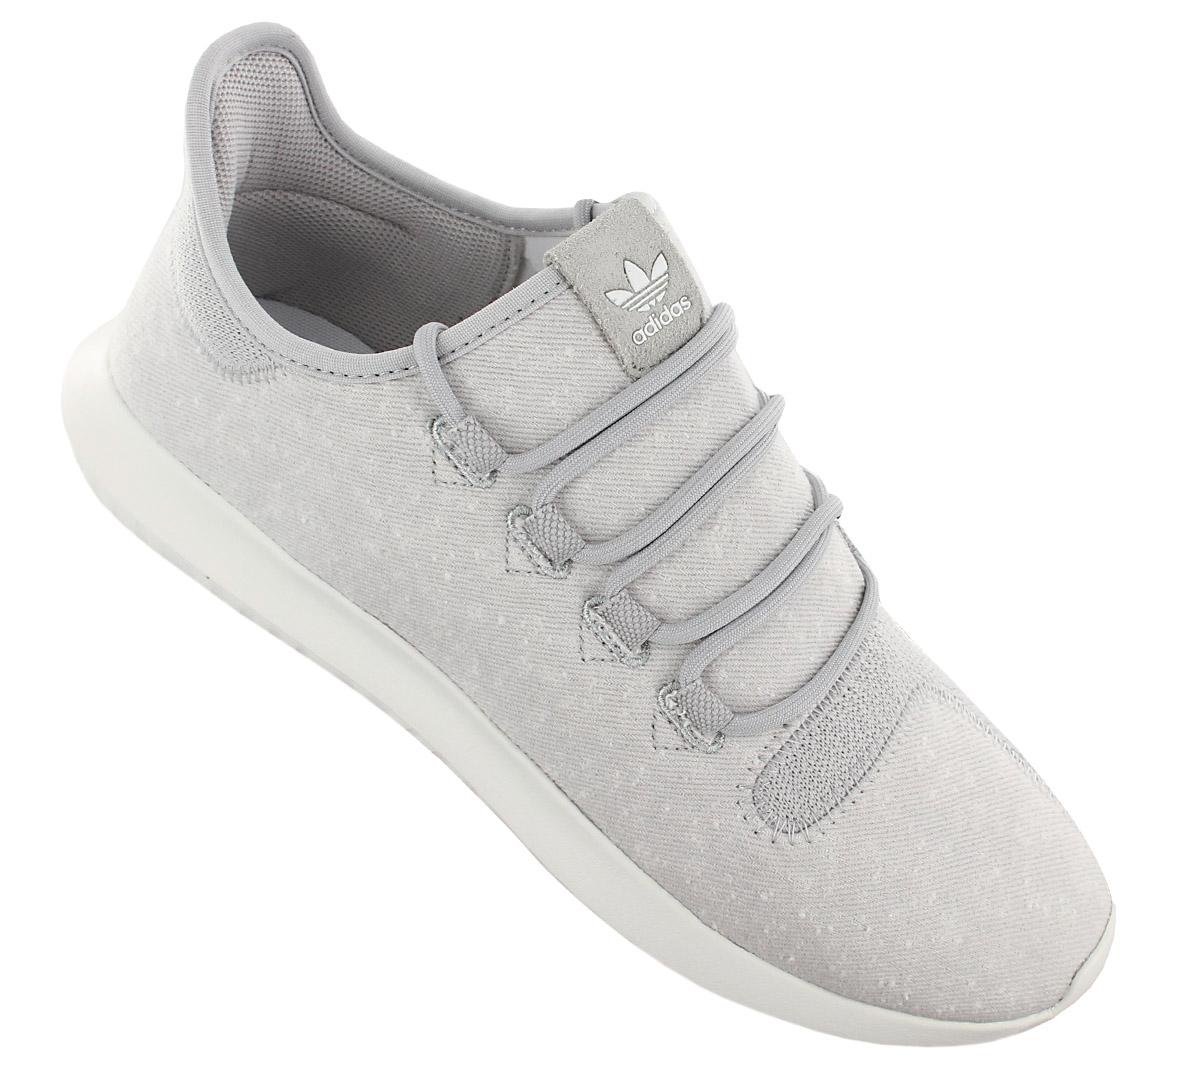 free shipping 0794b 46766 Adidas Originals Tubular Shadow Men s Sneakers Shoes Zapatillas ...